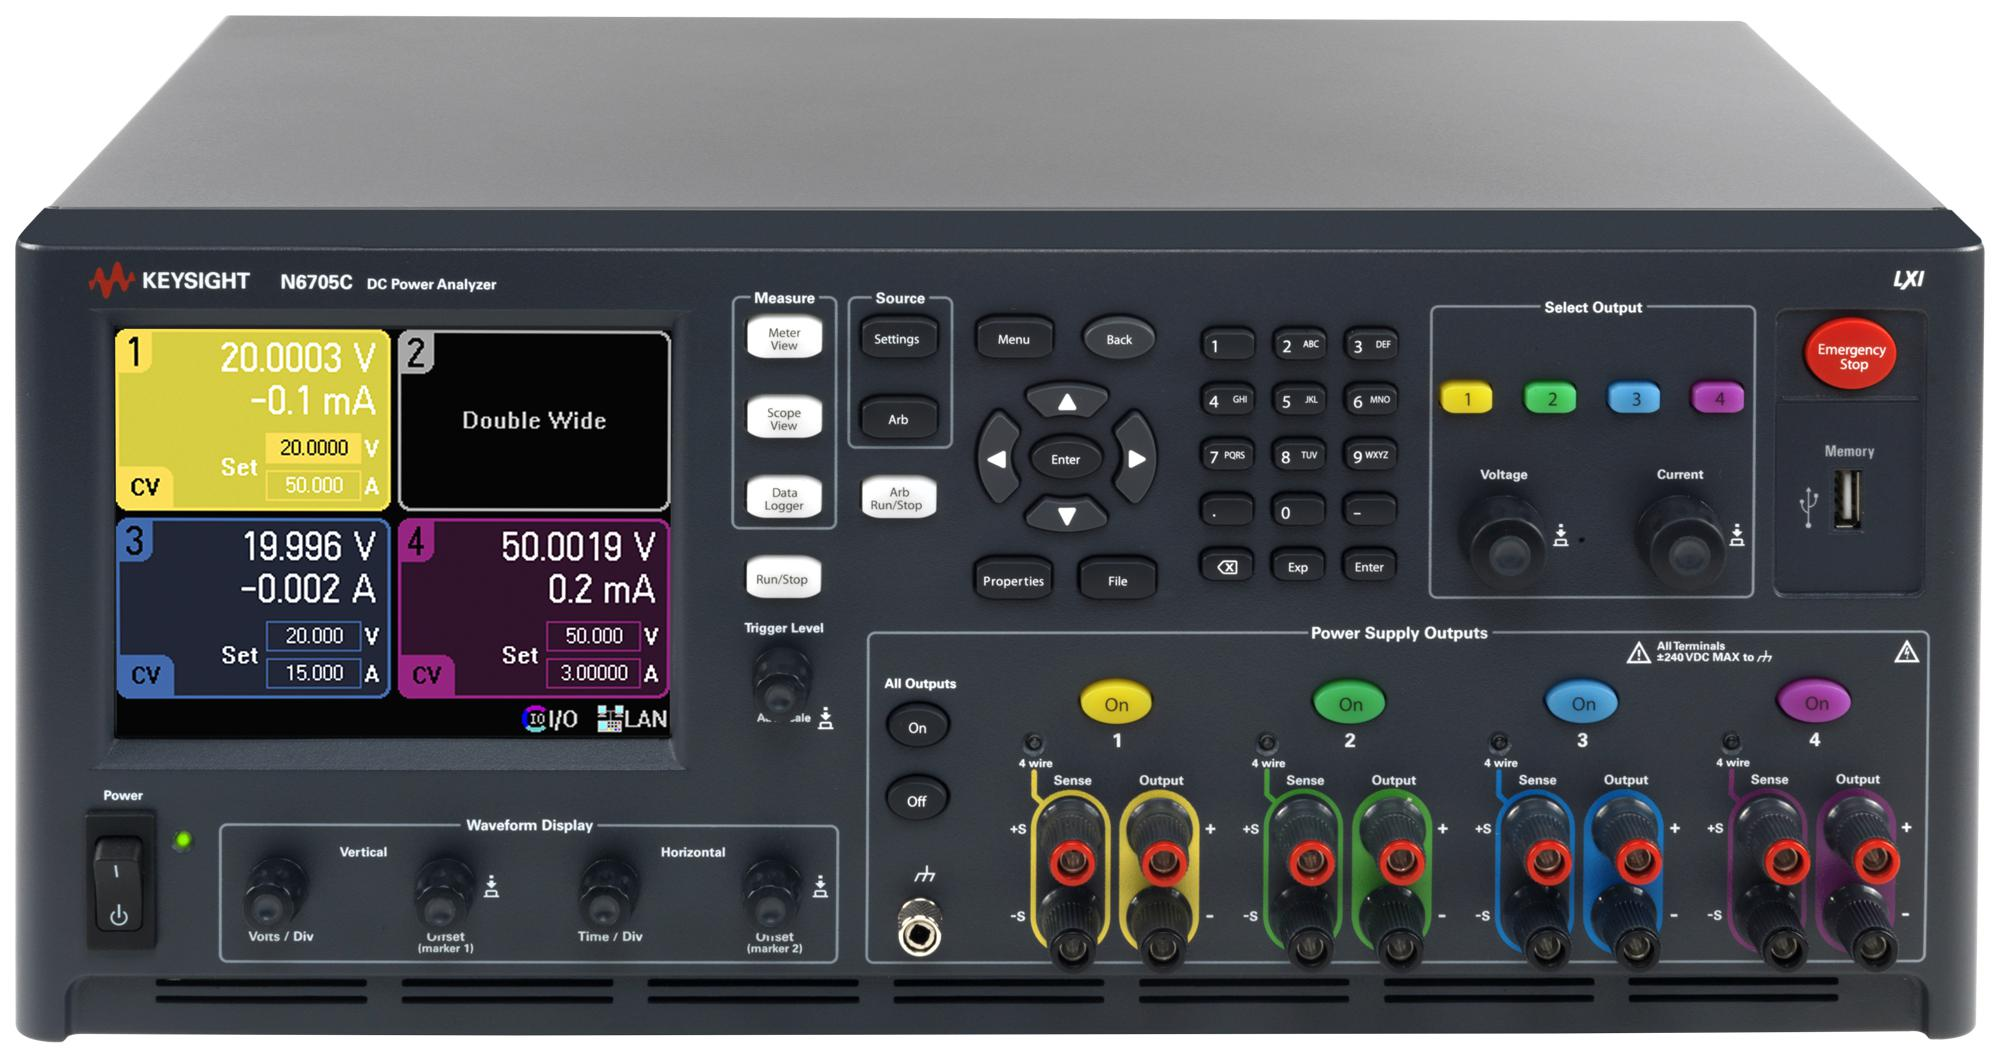 N6705c Keysight Technologies Bench Power Supply